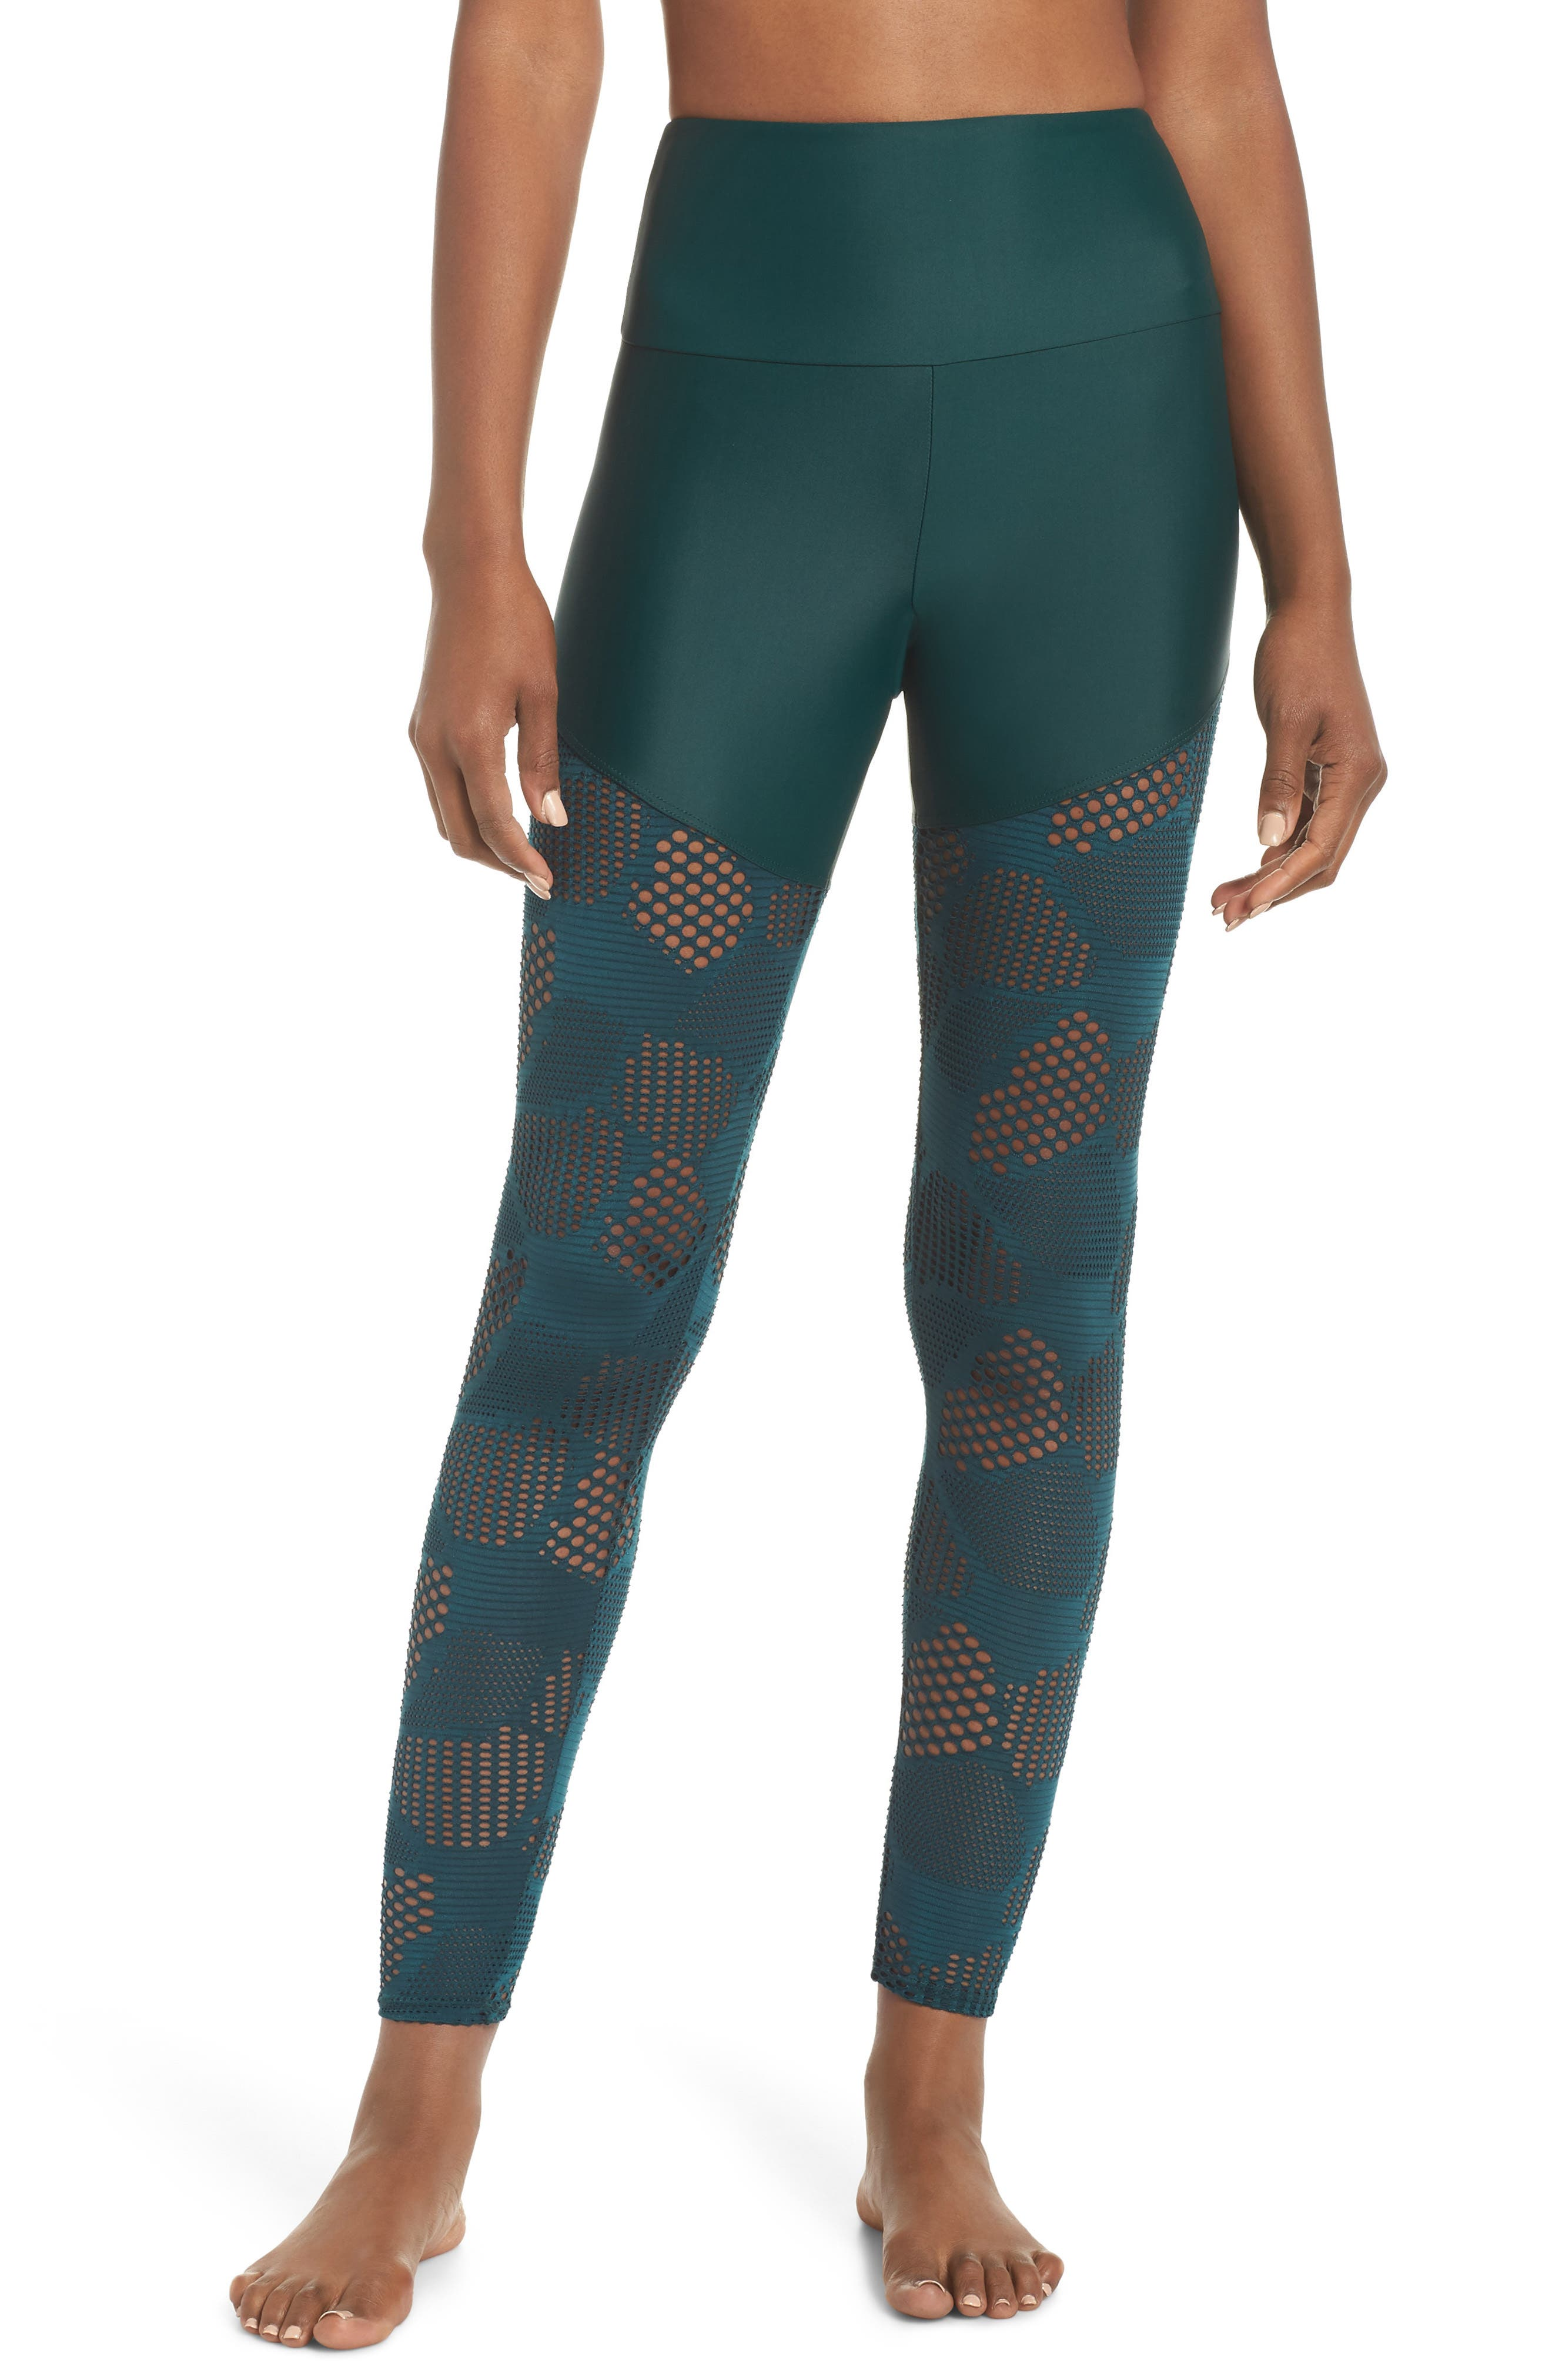 Half/Half 2.0 Leggings,                         Main,                         color, ALPINE HONEYCOMB